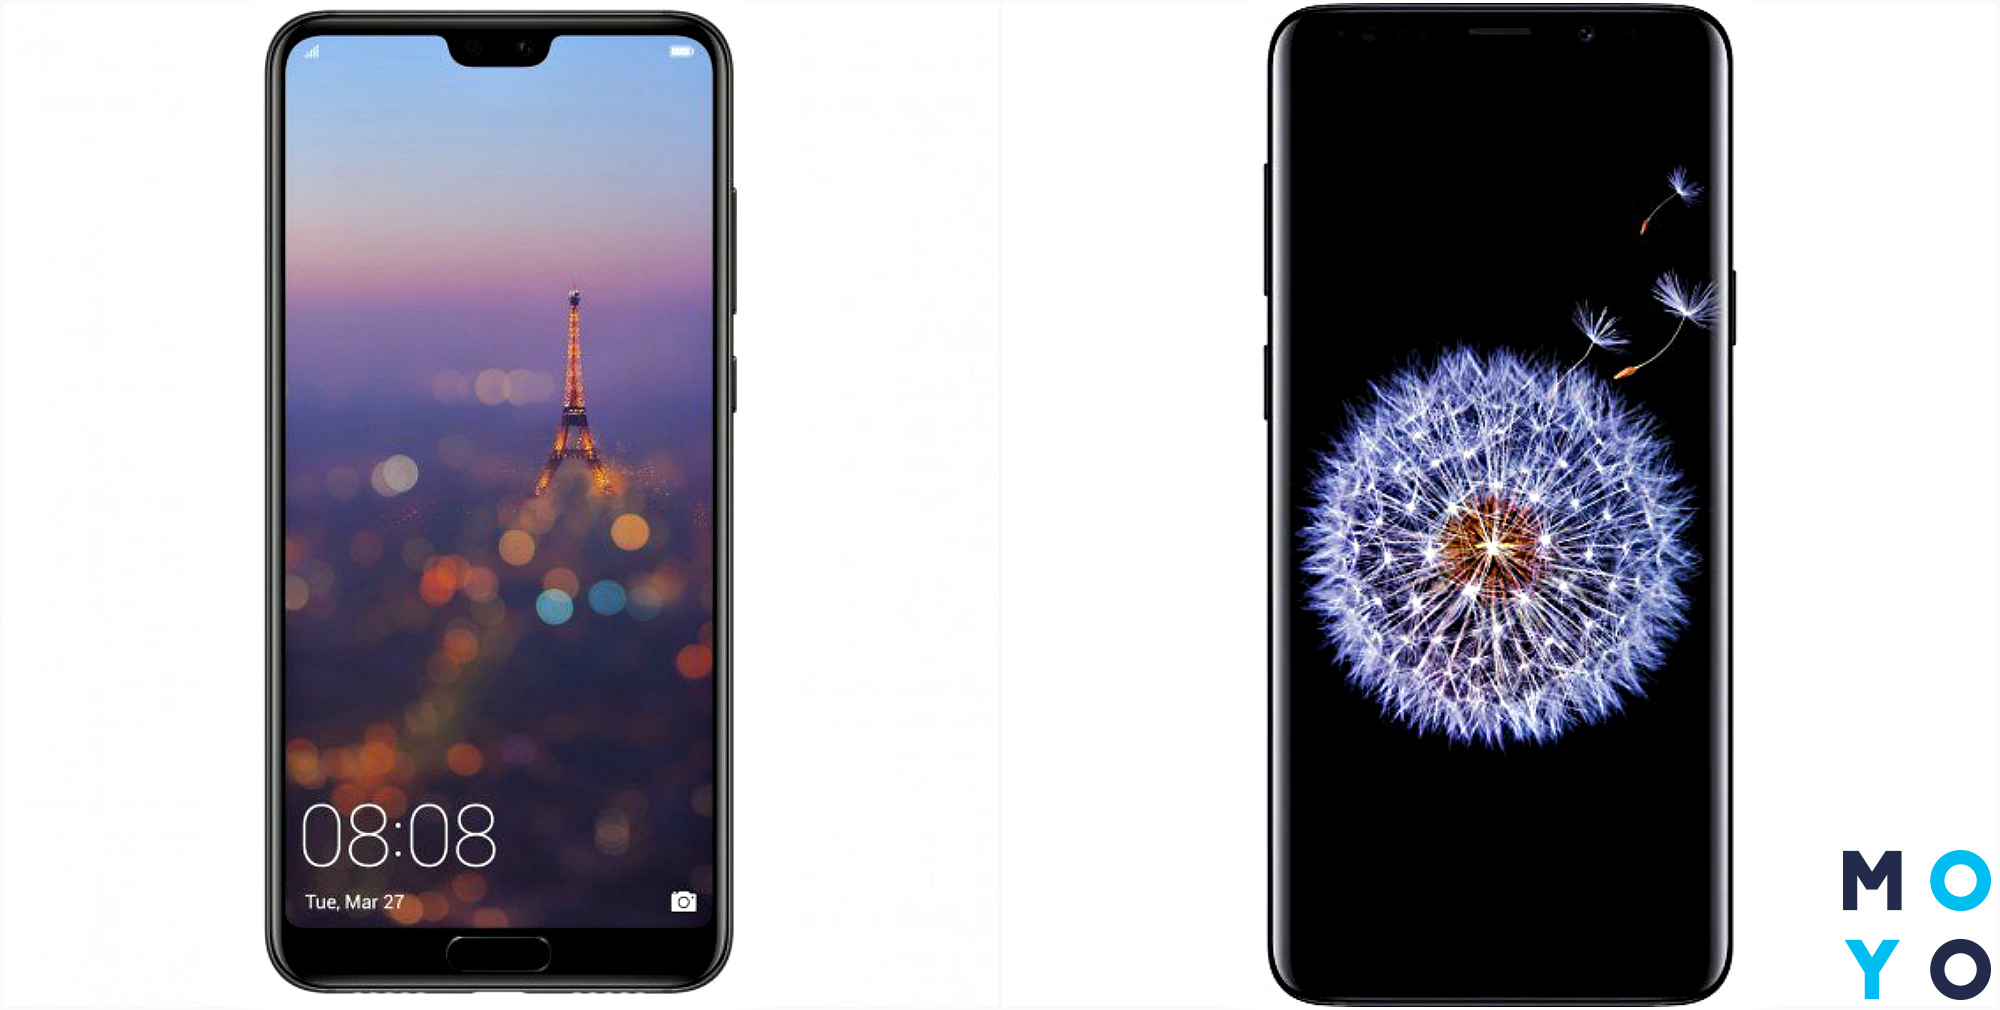 Камерофоны Huawei P20 Pro и Samsung Galaxy S9